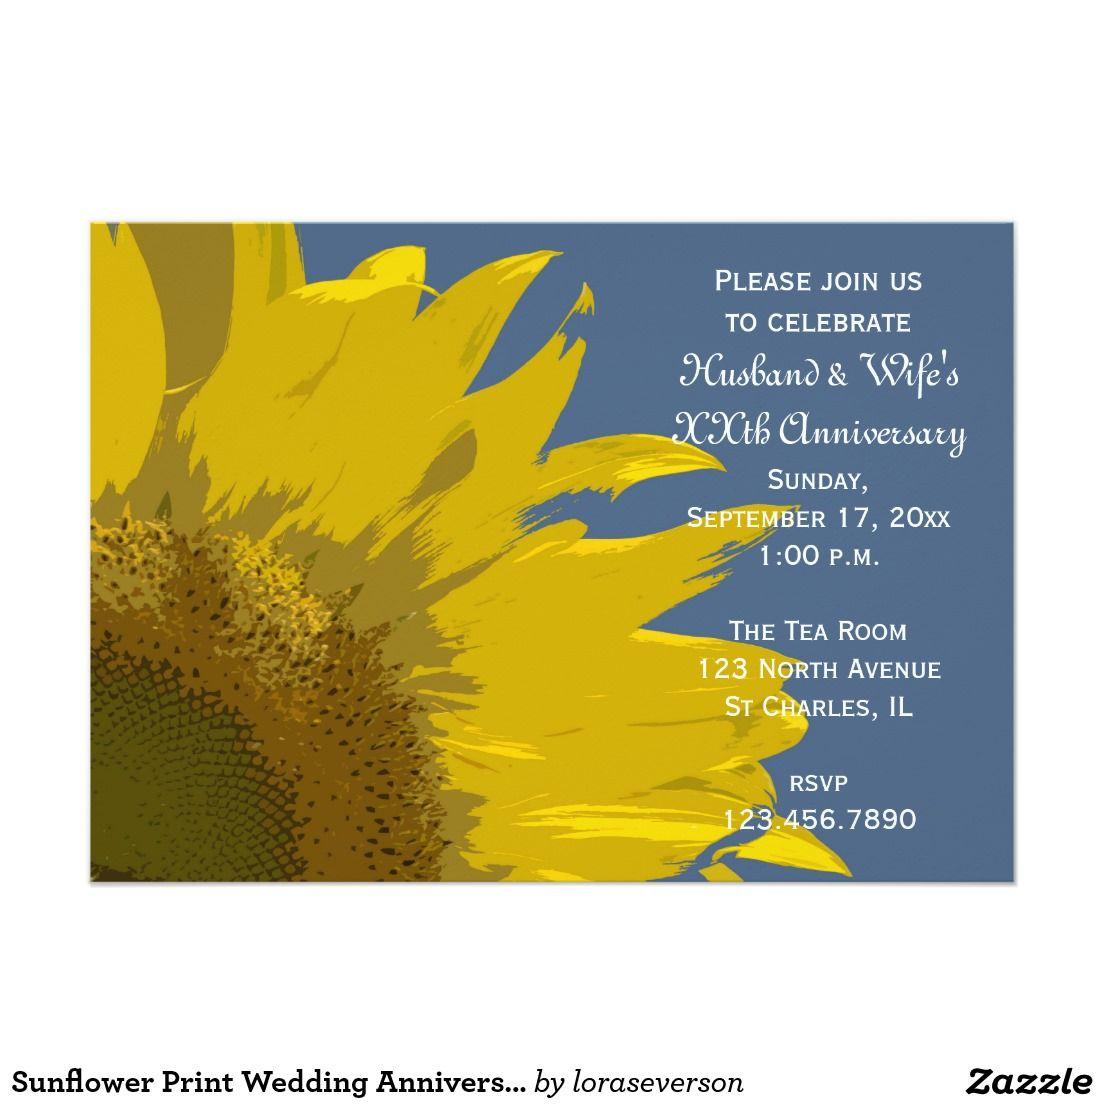 Sunflower Print Wedding Anniversary Party Invite | Sunflower wedding ...